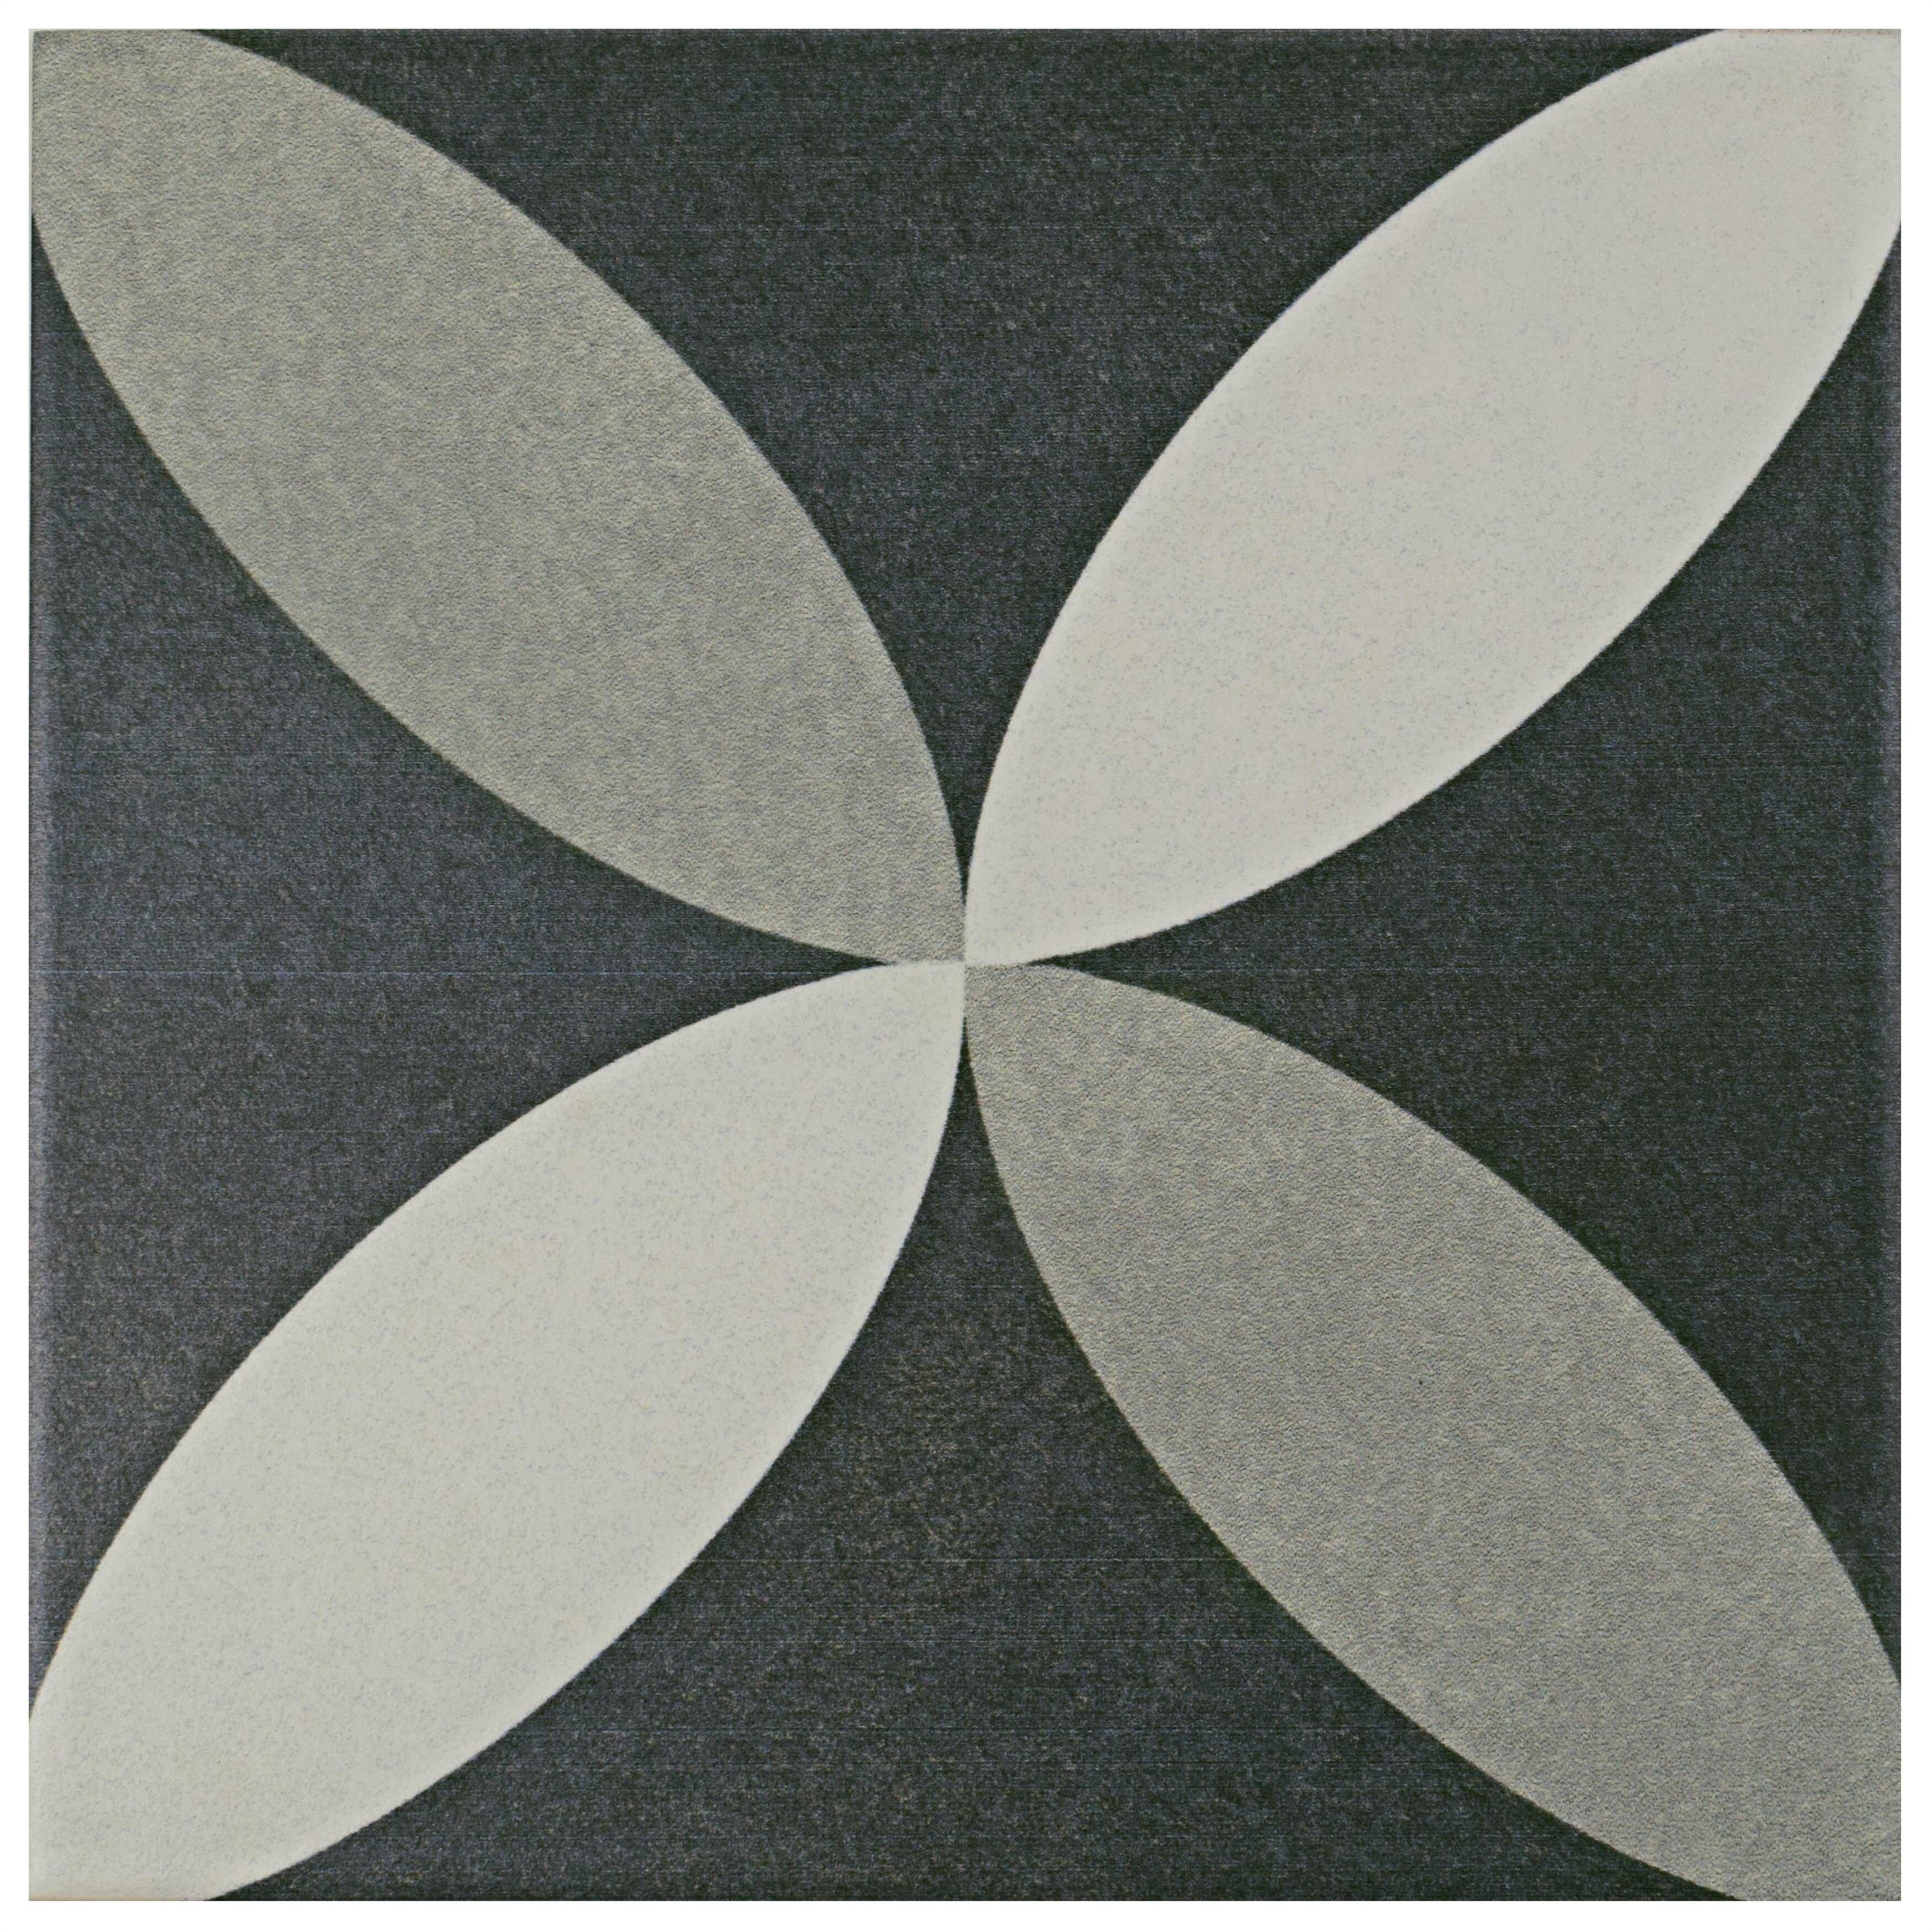 Elitetile allmodern forties 775 x 775 ceramic field tile in petal gray dailygadgetfo Choice Image